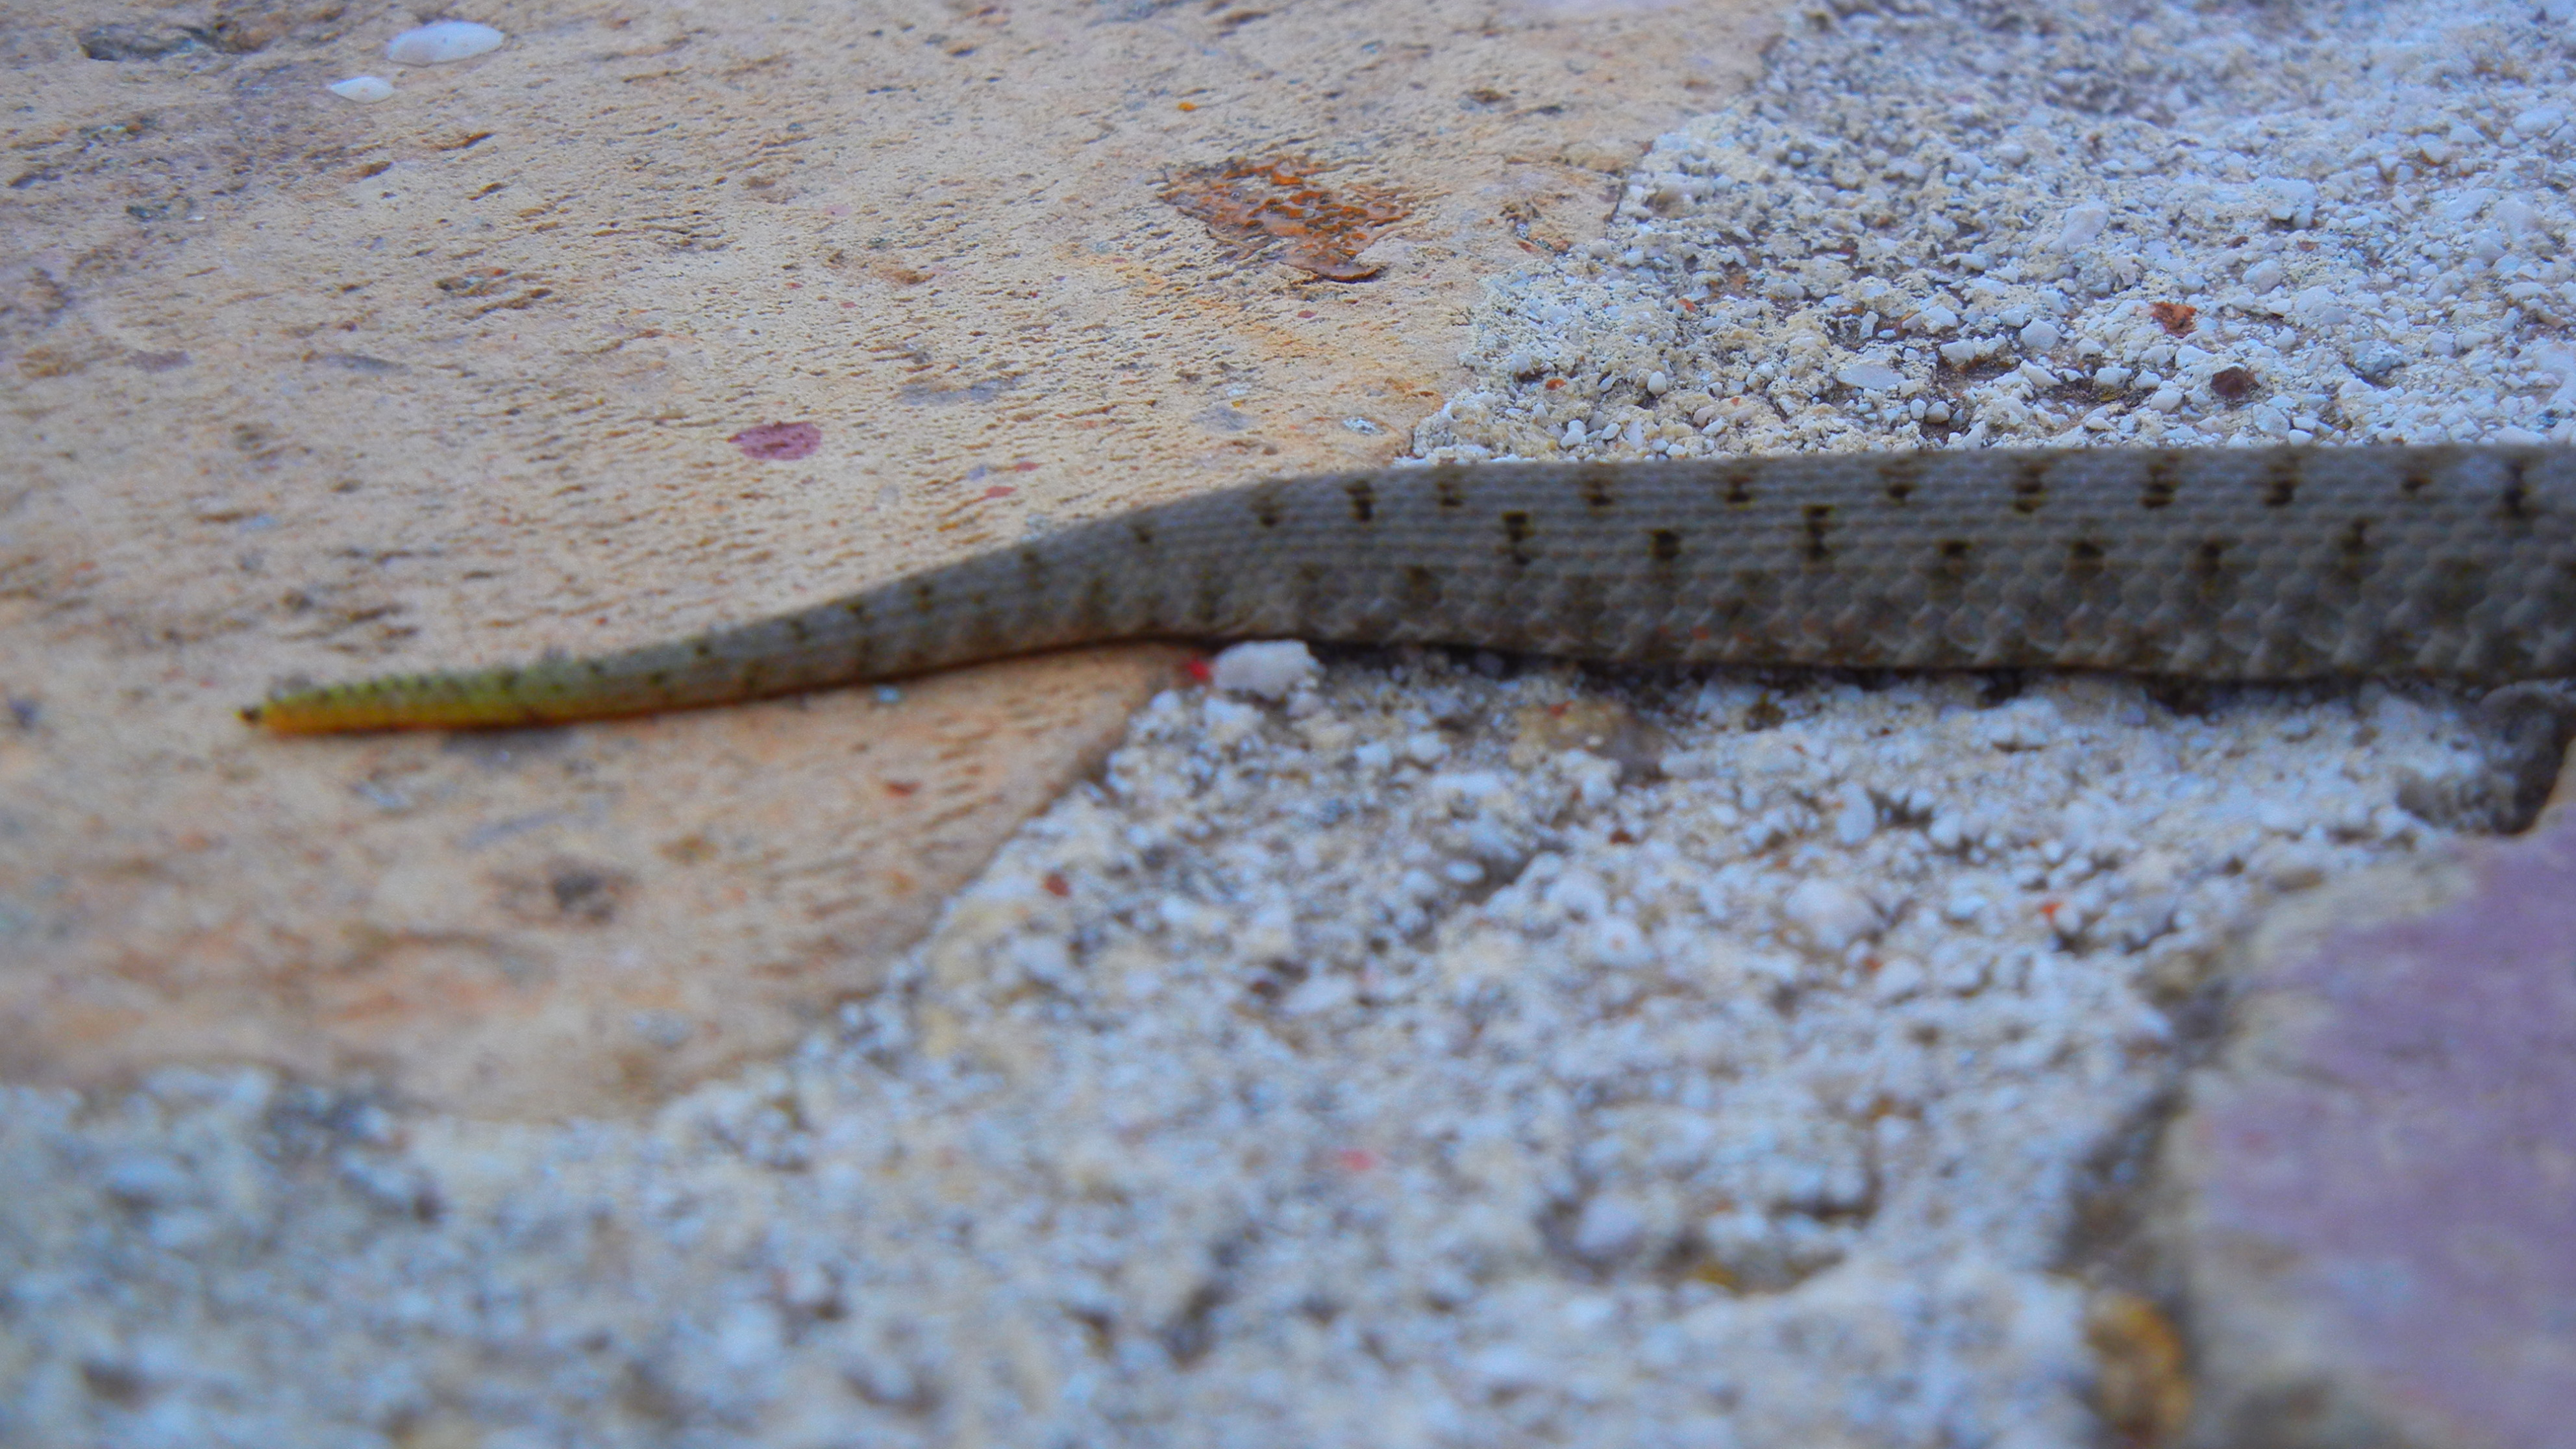 Marasso palustre cleopatra aspide biacco frustone for Serpente frustone